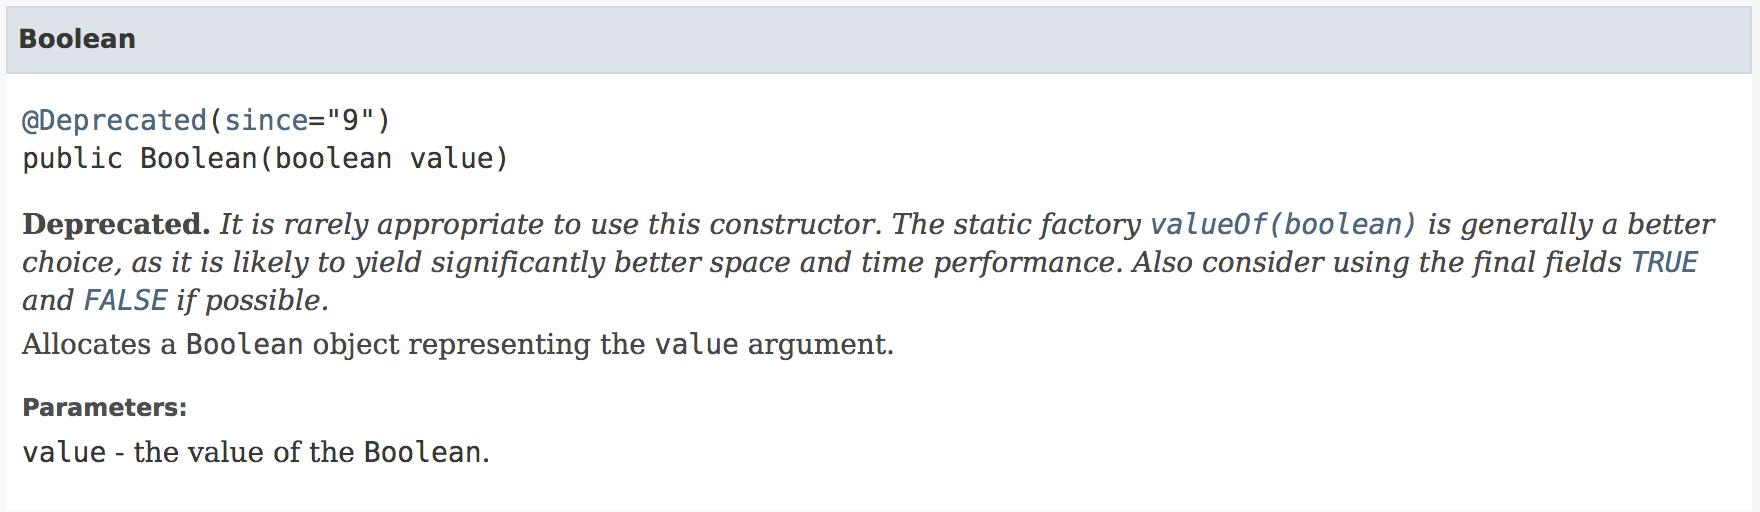 JavaDoc 关于 Boolean 的说明截取